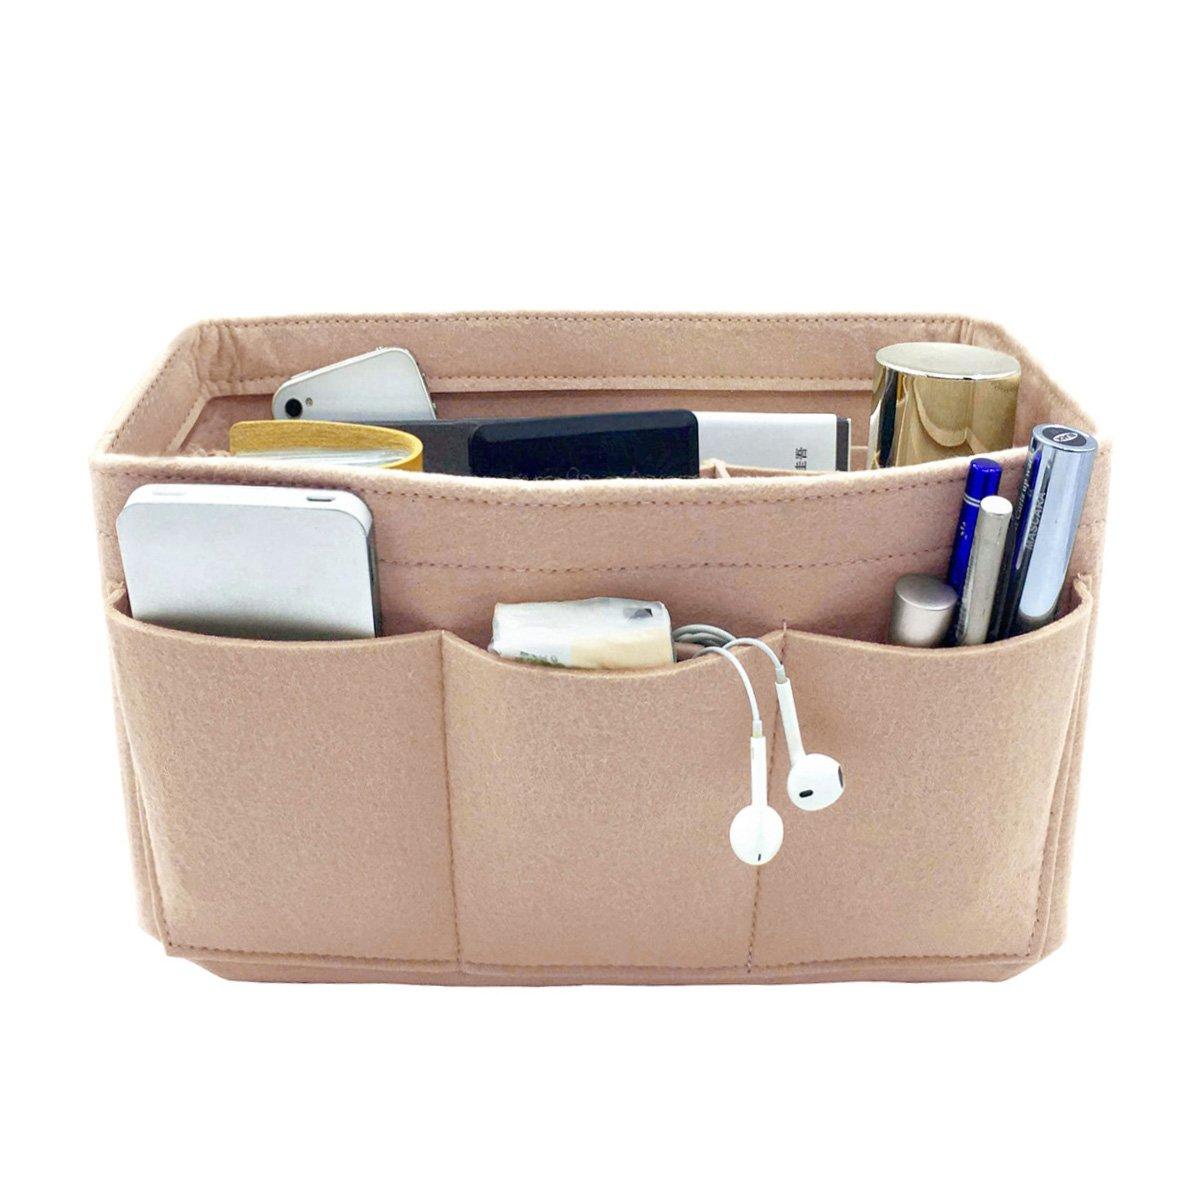 VANCORE 12 Pockets Felt Purses and Handbag Organizer Insert Cosmetic Bag Perfect Gift for Women Nude S